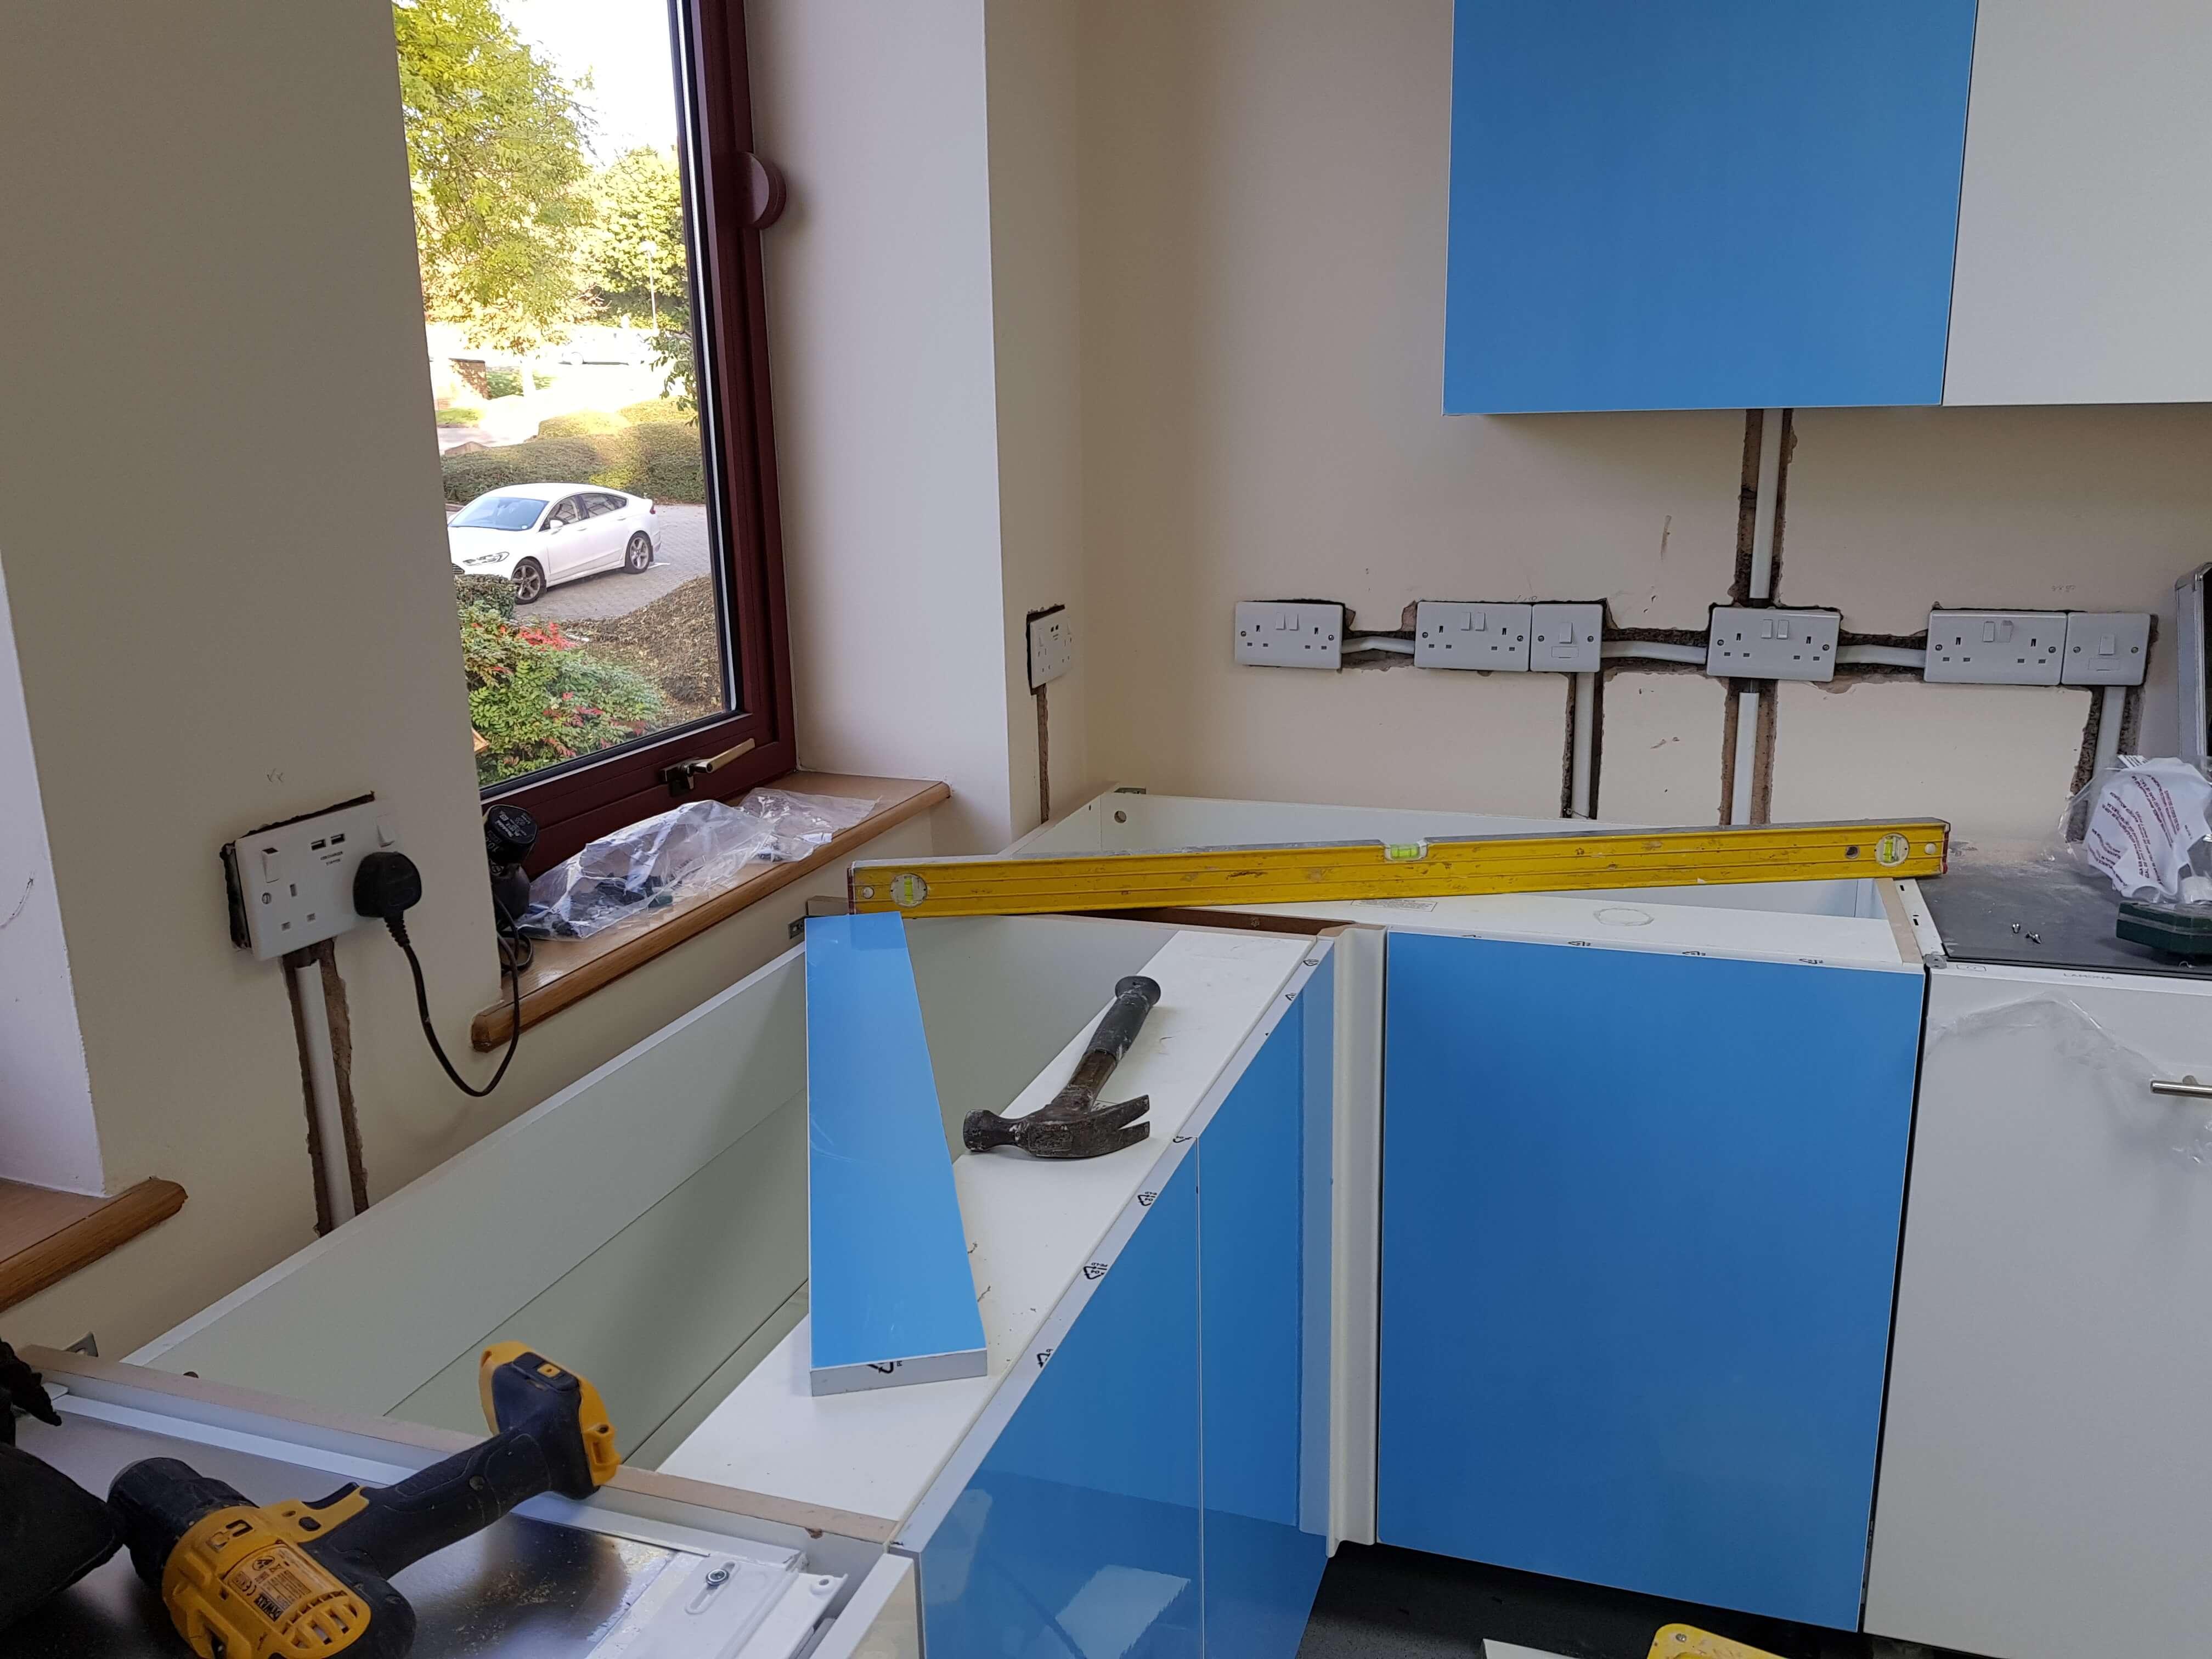 Kitchen units into a corner